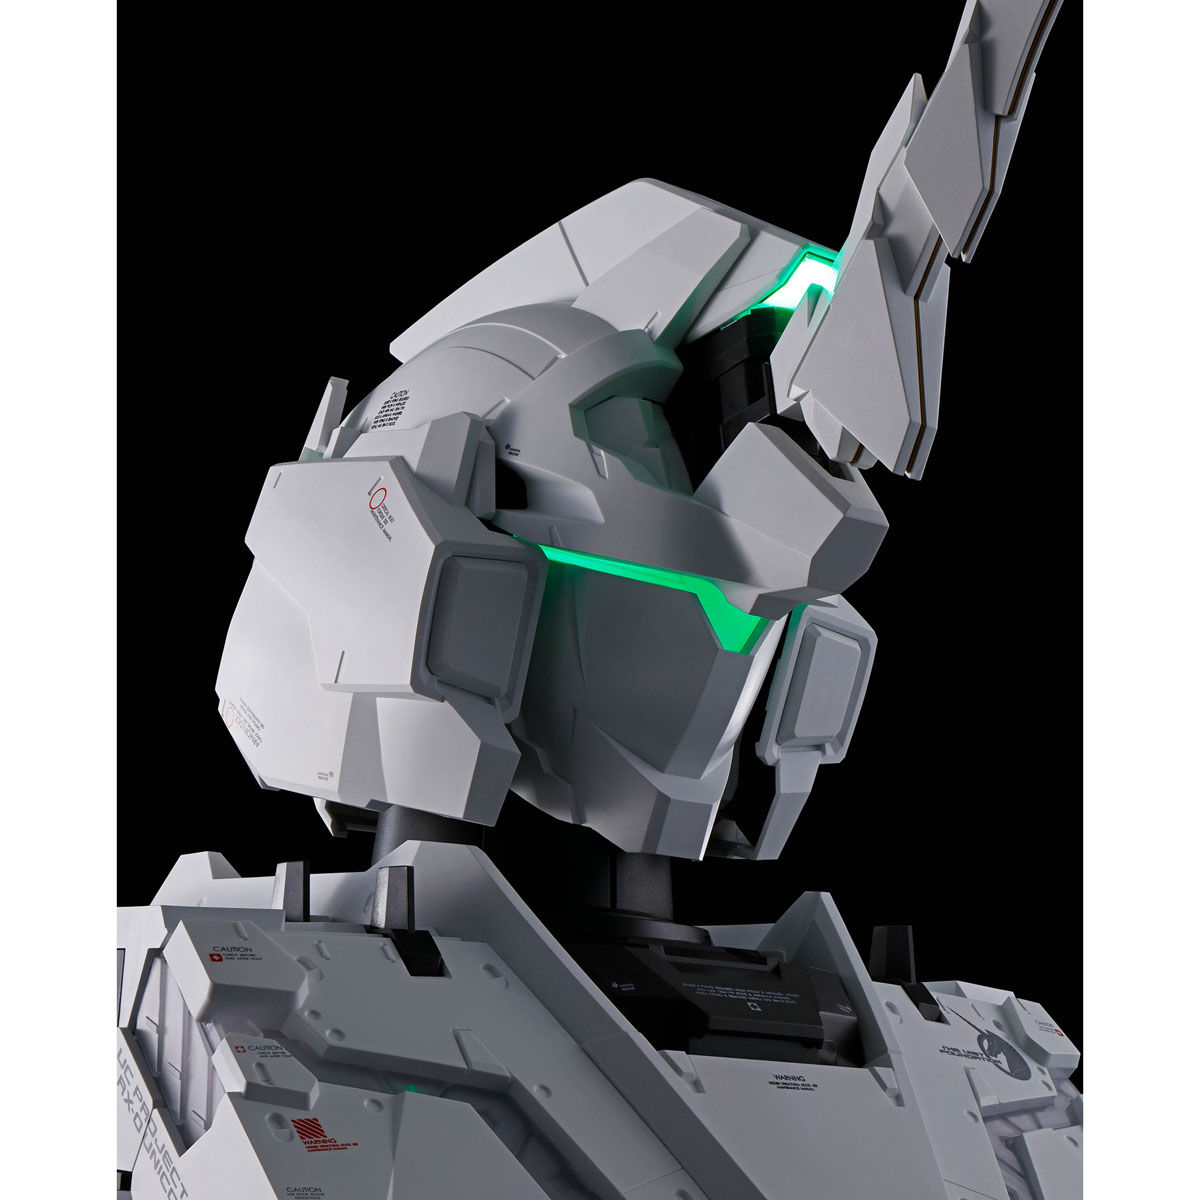 REAL EXPERIENCE MODEL RX-0 UNICORNGUNDAM(AUTO-TRANS edition) [Dec 2021 Delivery]  (Premium Included)